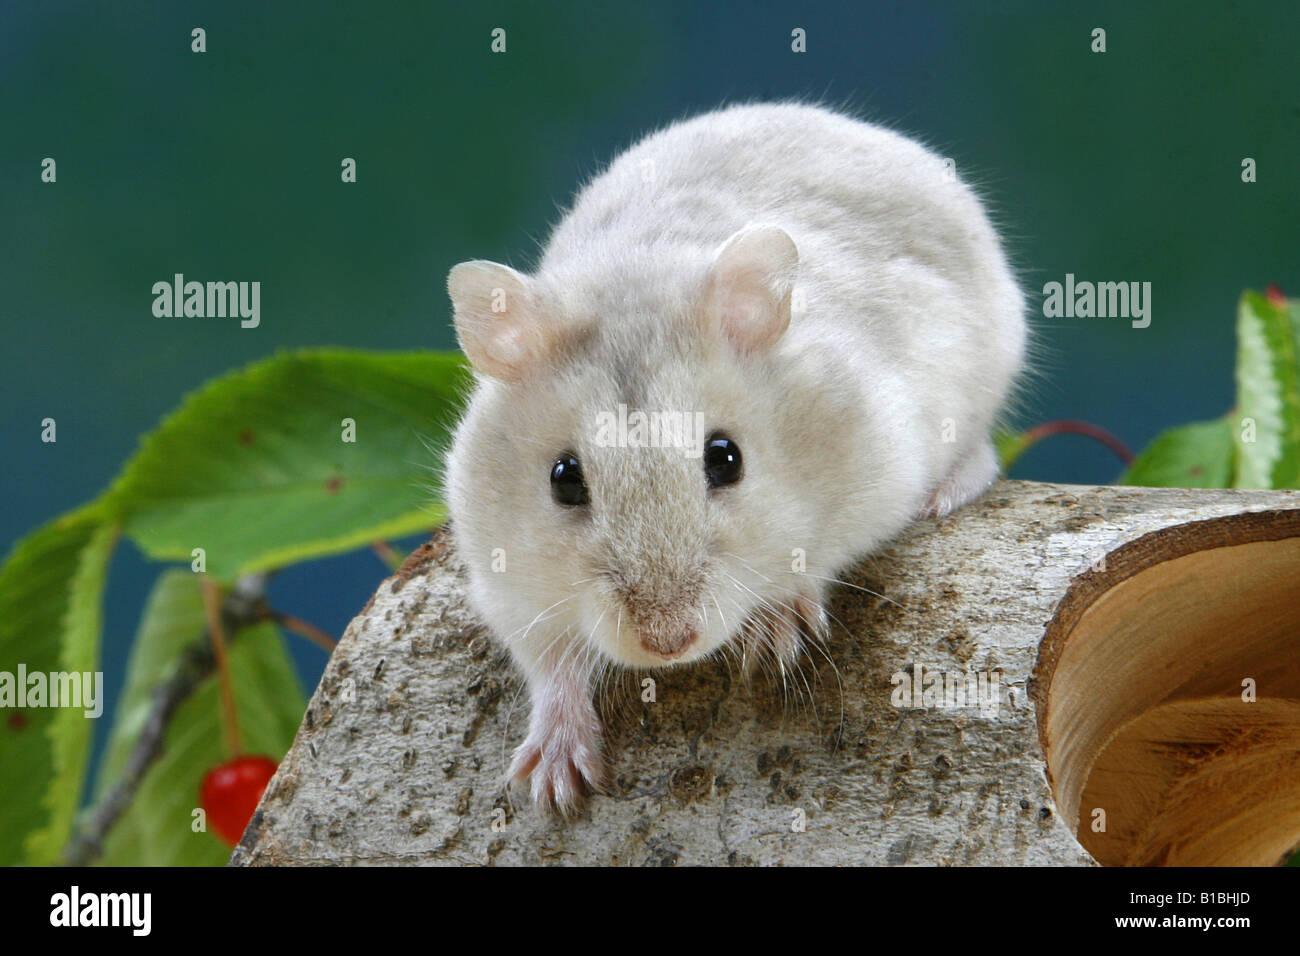 Robo Hamster Stock Photos & Robo Hamster Stock Images - Alamy